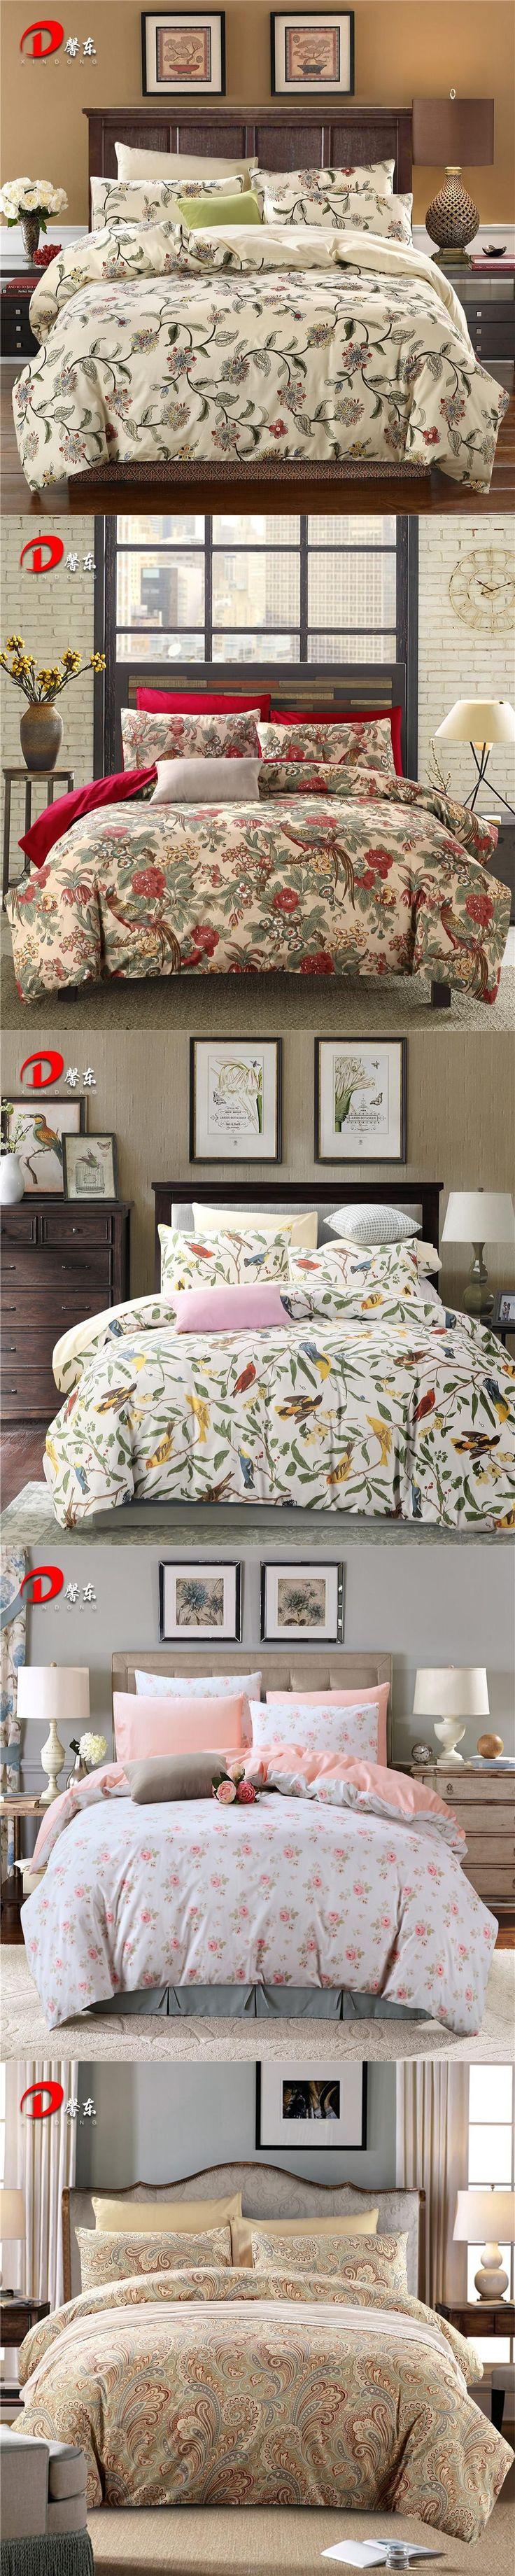 Best 25+ Egyptian cotton bedding ideas on Pinterest | Ruffle duvet ...